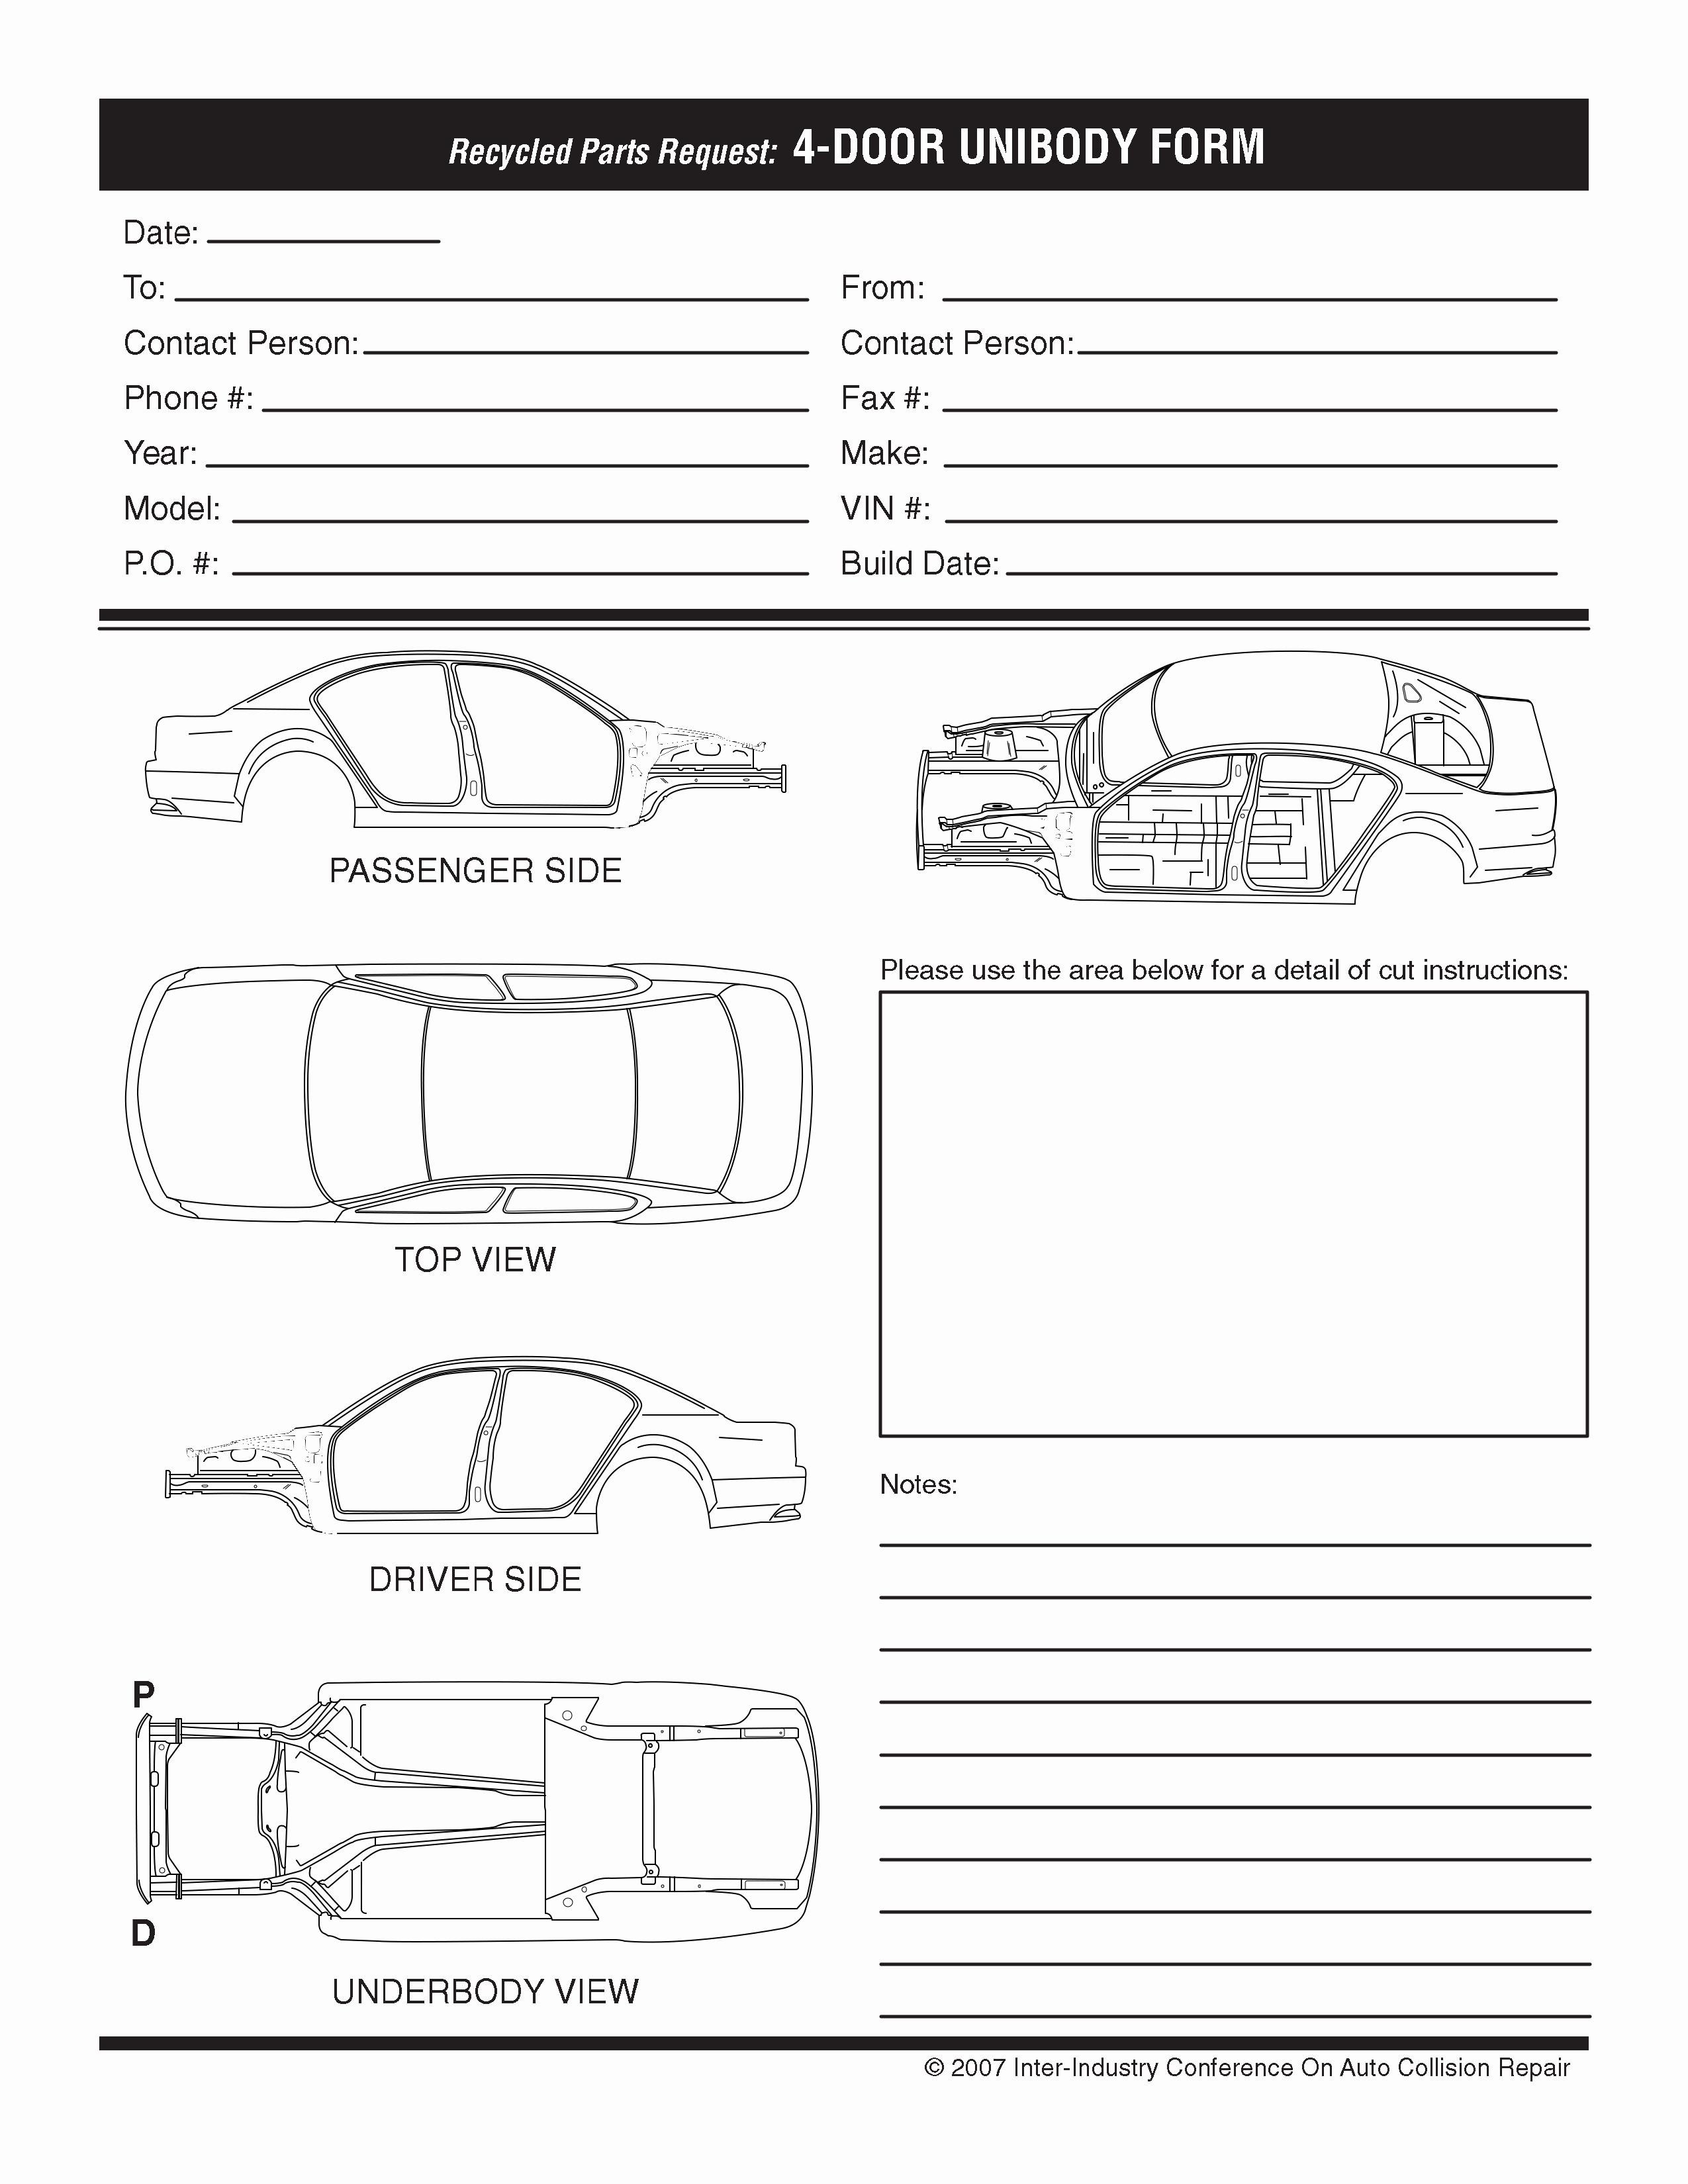 Auto Body Shop forms Luxury Vehicle Cut Sheets Baird S Auto Parts